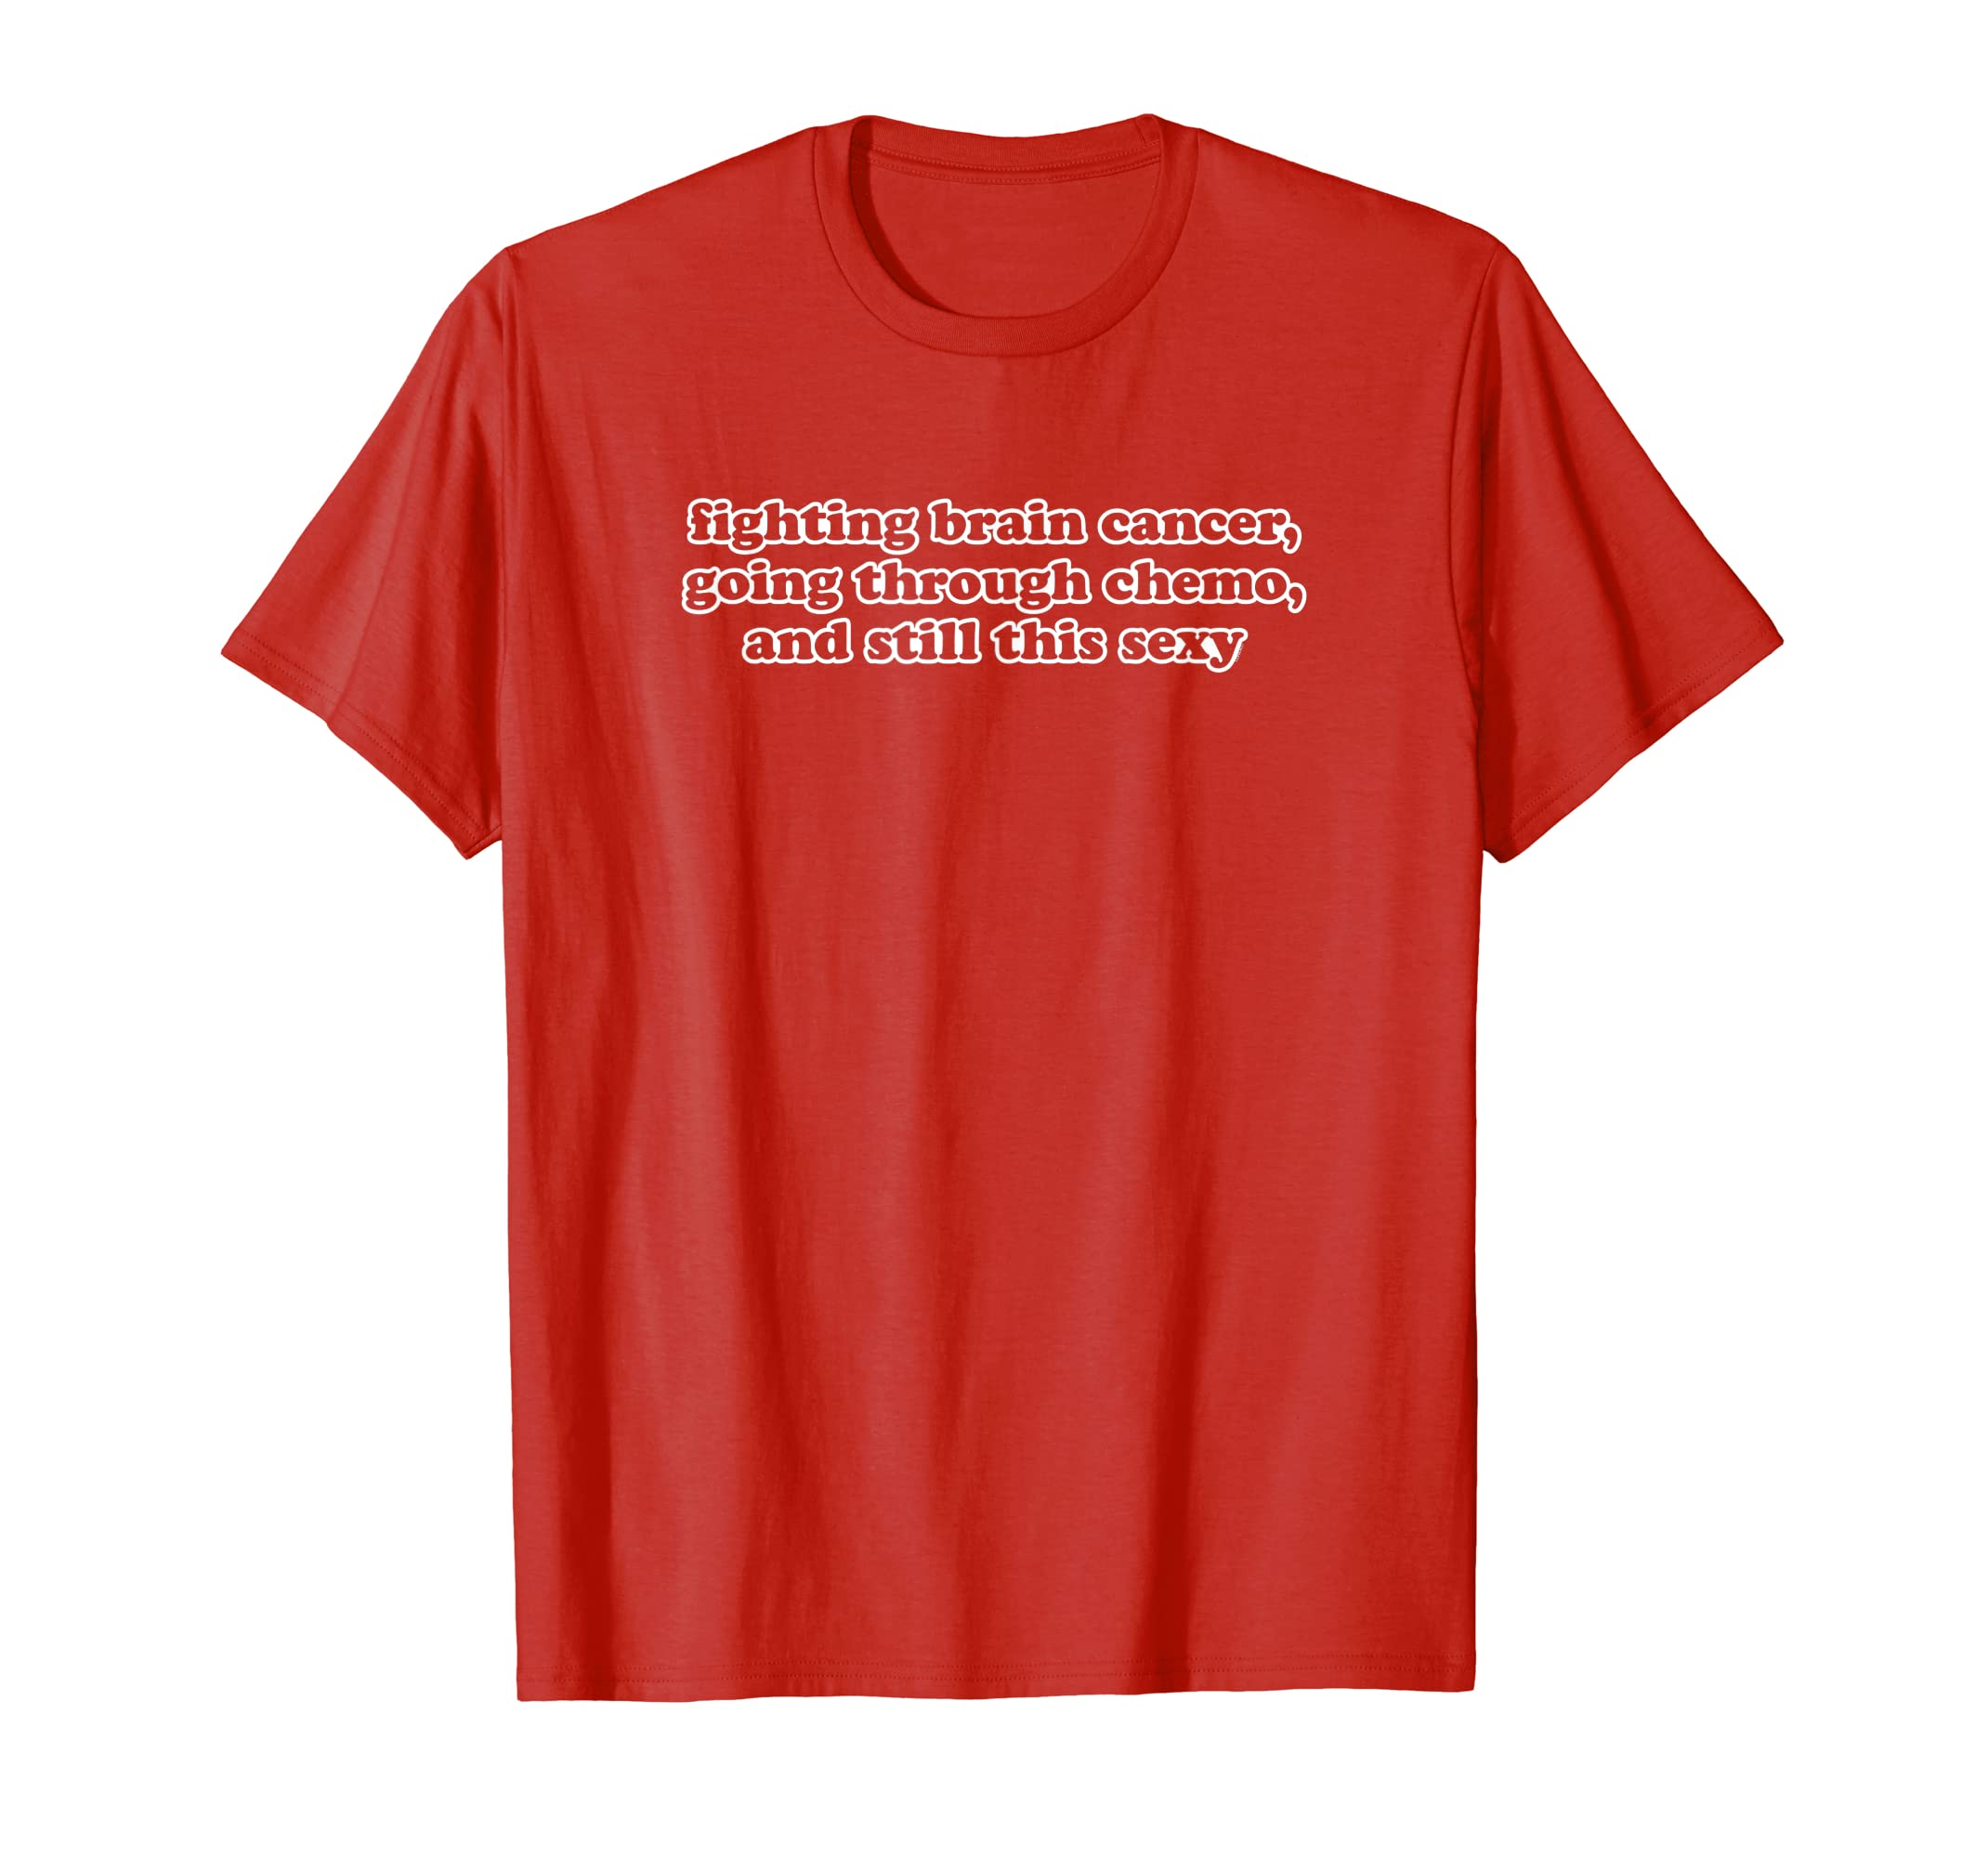 8c5ec20bc8 Amazon.com: Brain Cancer Shirt   Funny Going Through Chemo Sexy Quote:  Clothing